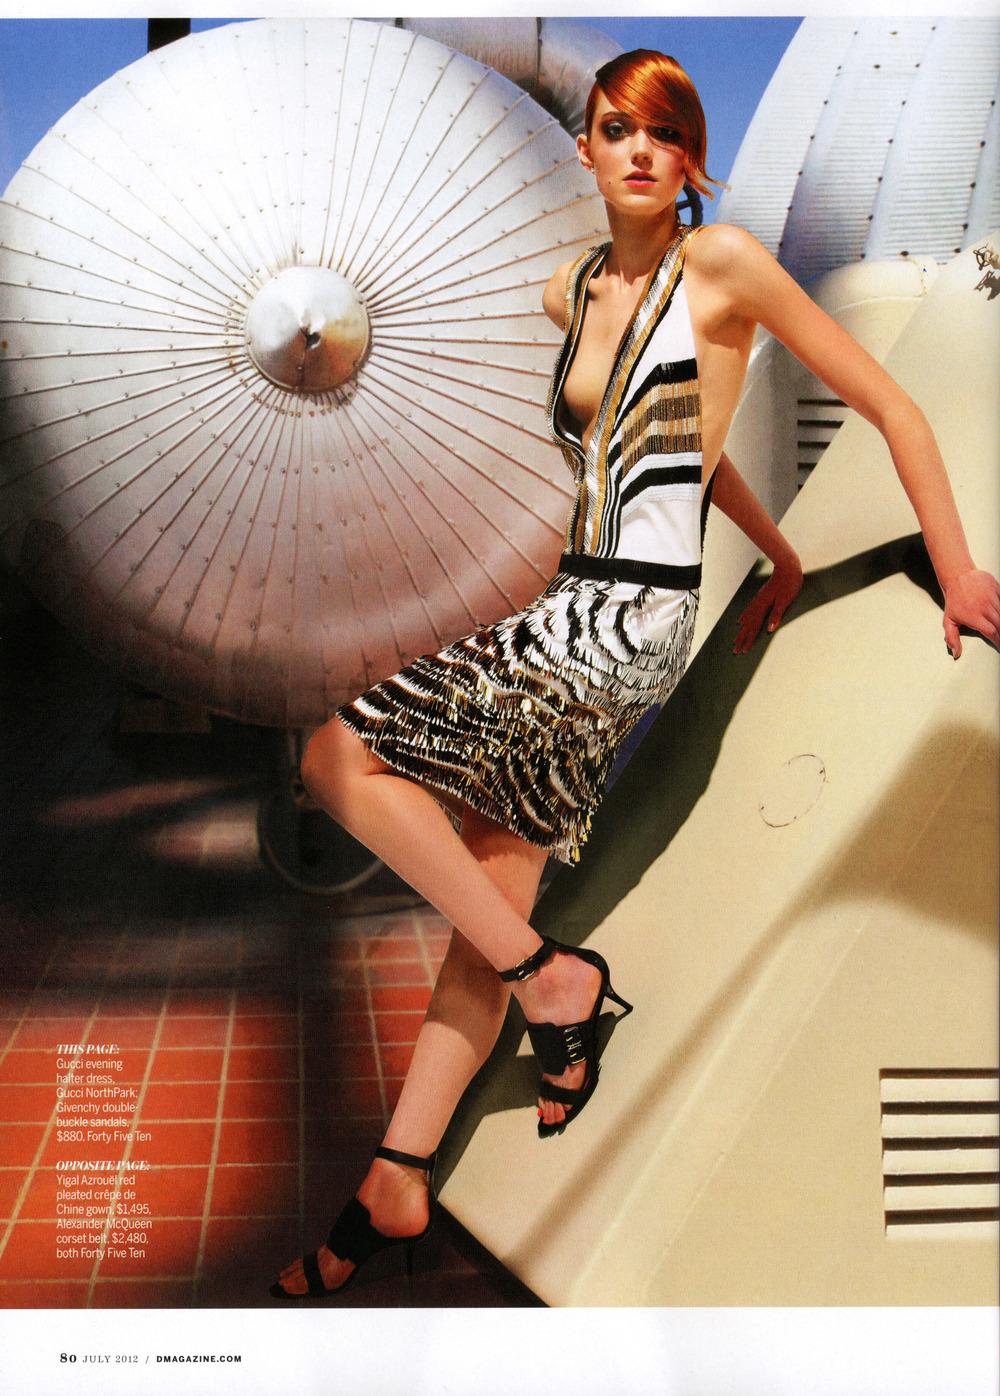 Emily Campbell July 2012 D Magazine 2.jpg